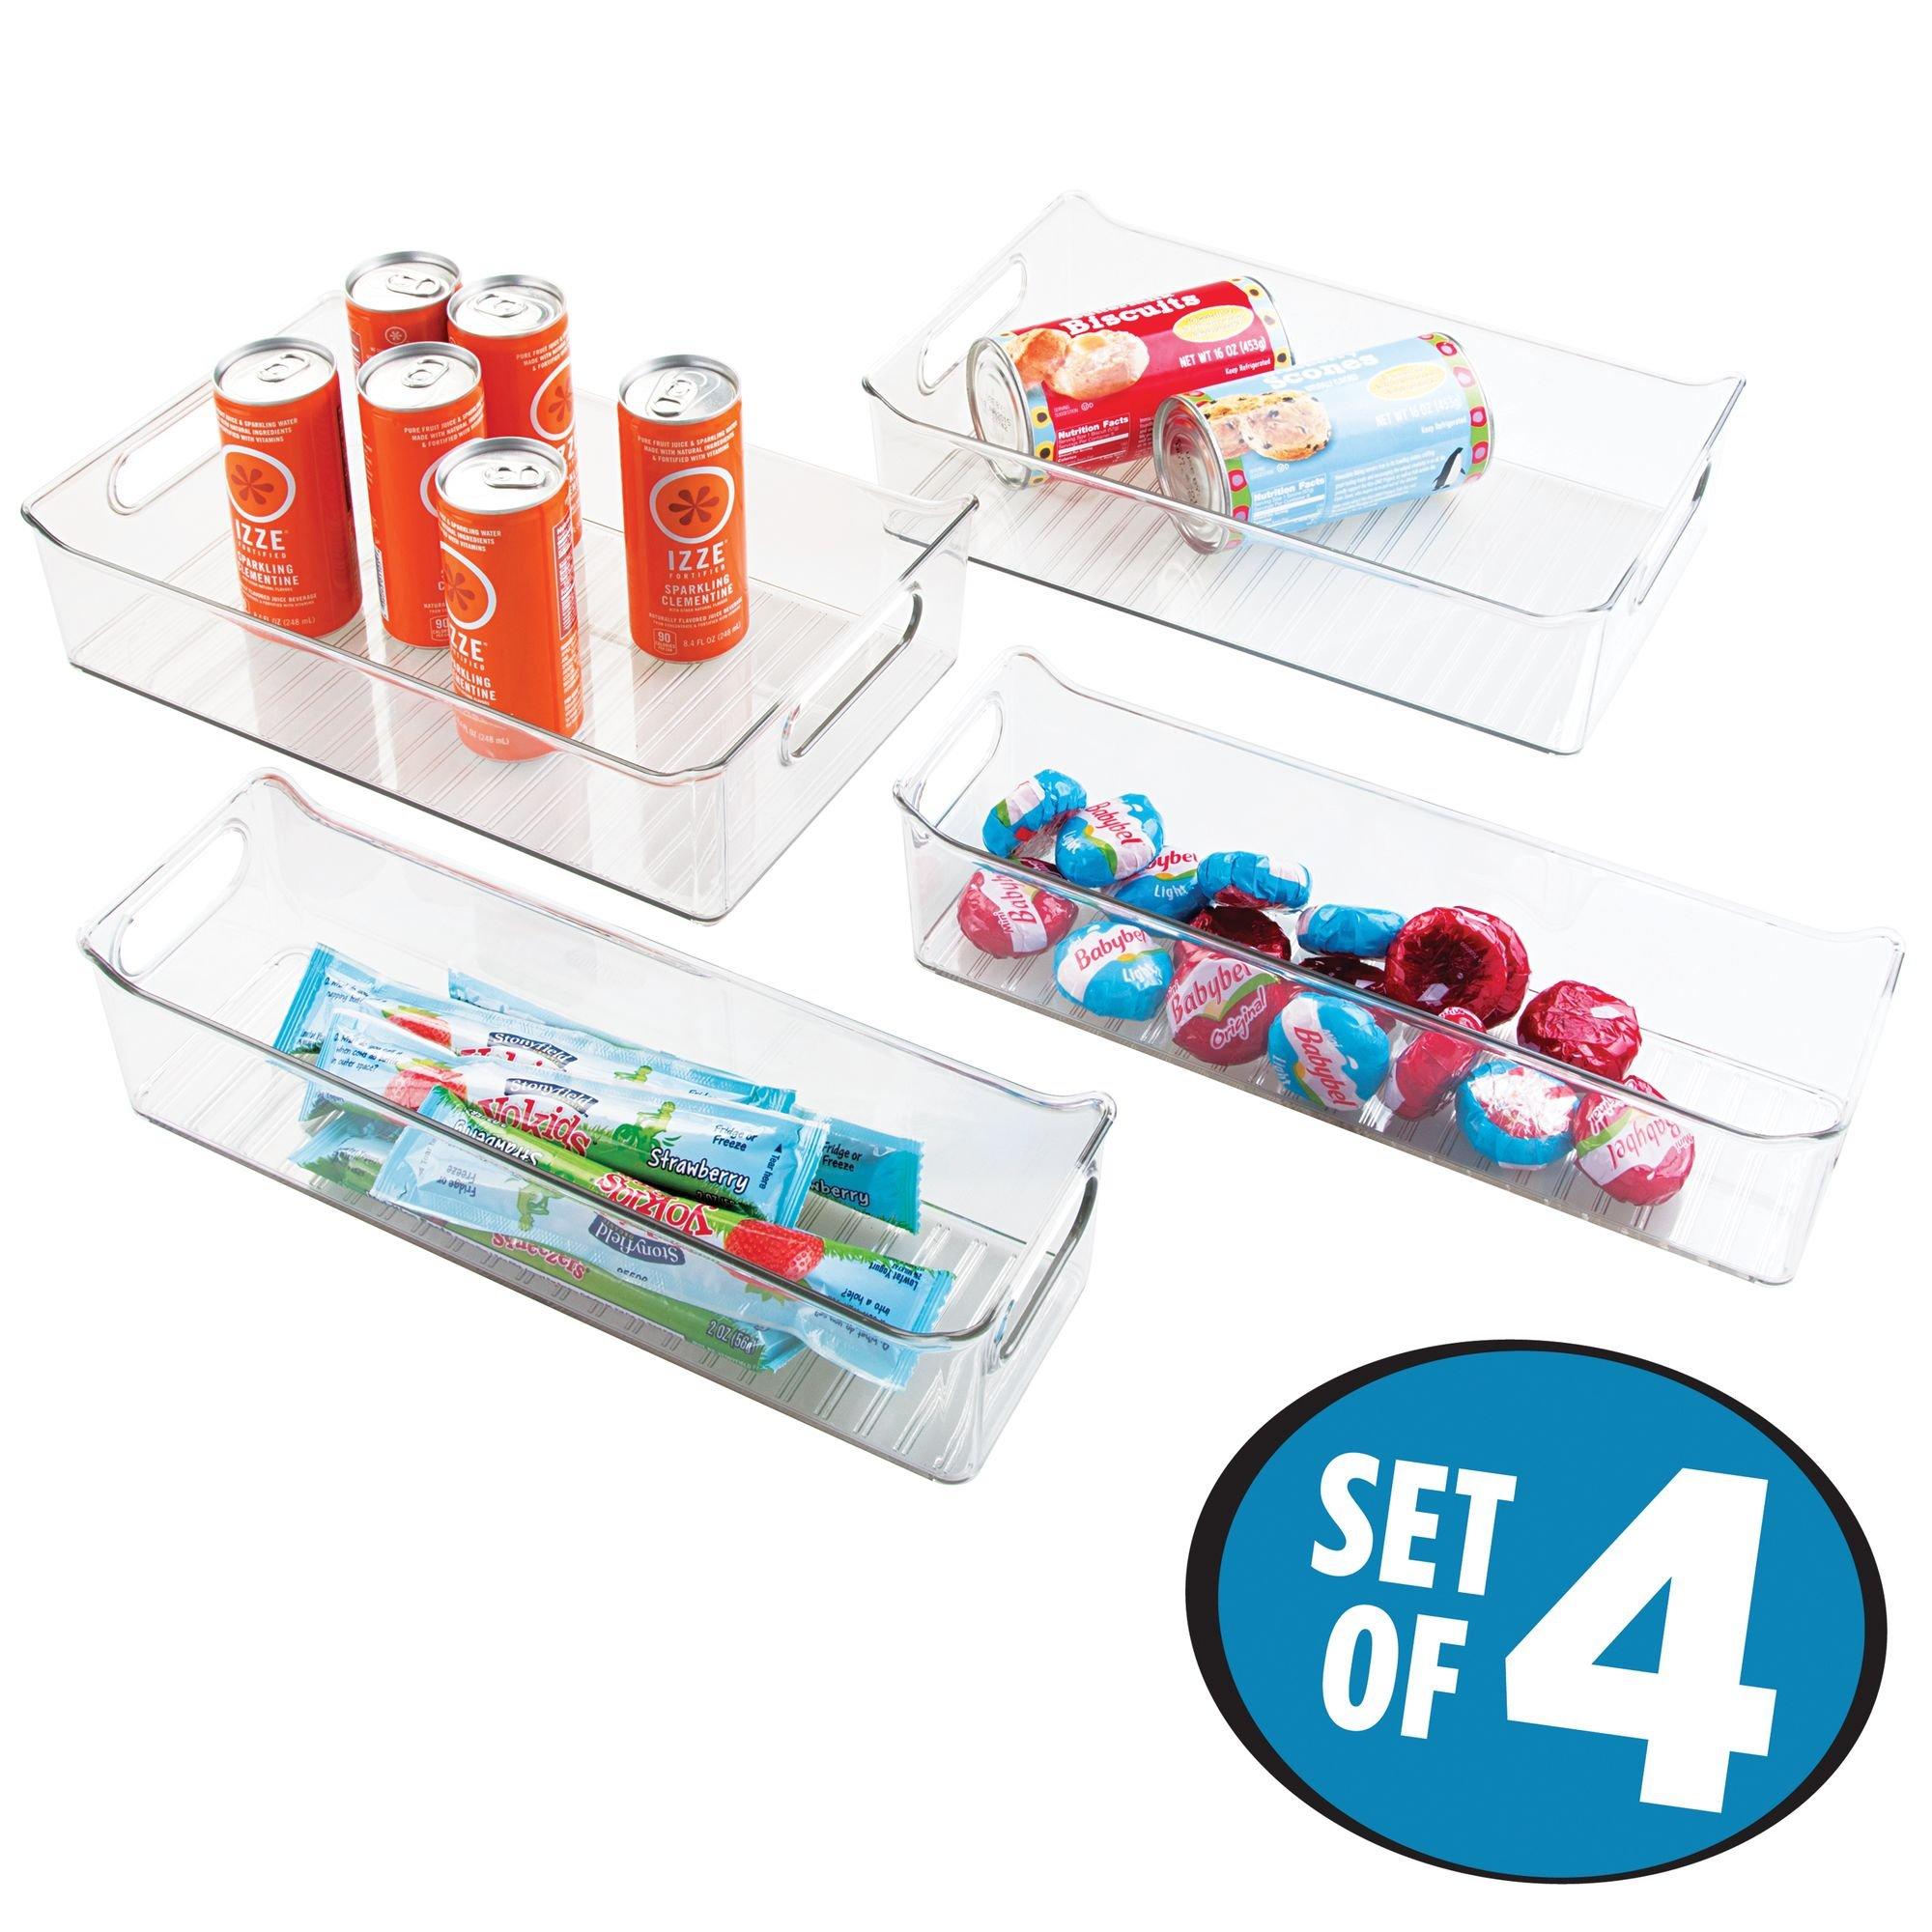 mDesign Kitchen, Pantry, Refrigerator, Freezer Storage Organizer Bins - Set of 4, Clear by mDesign